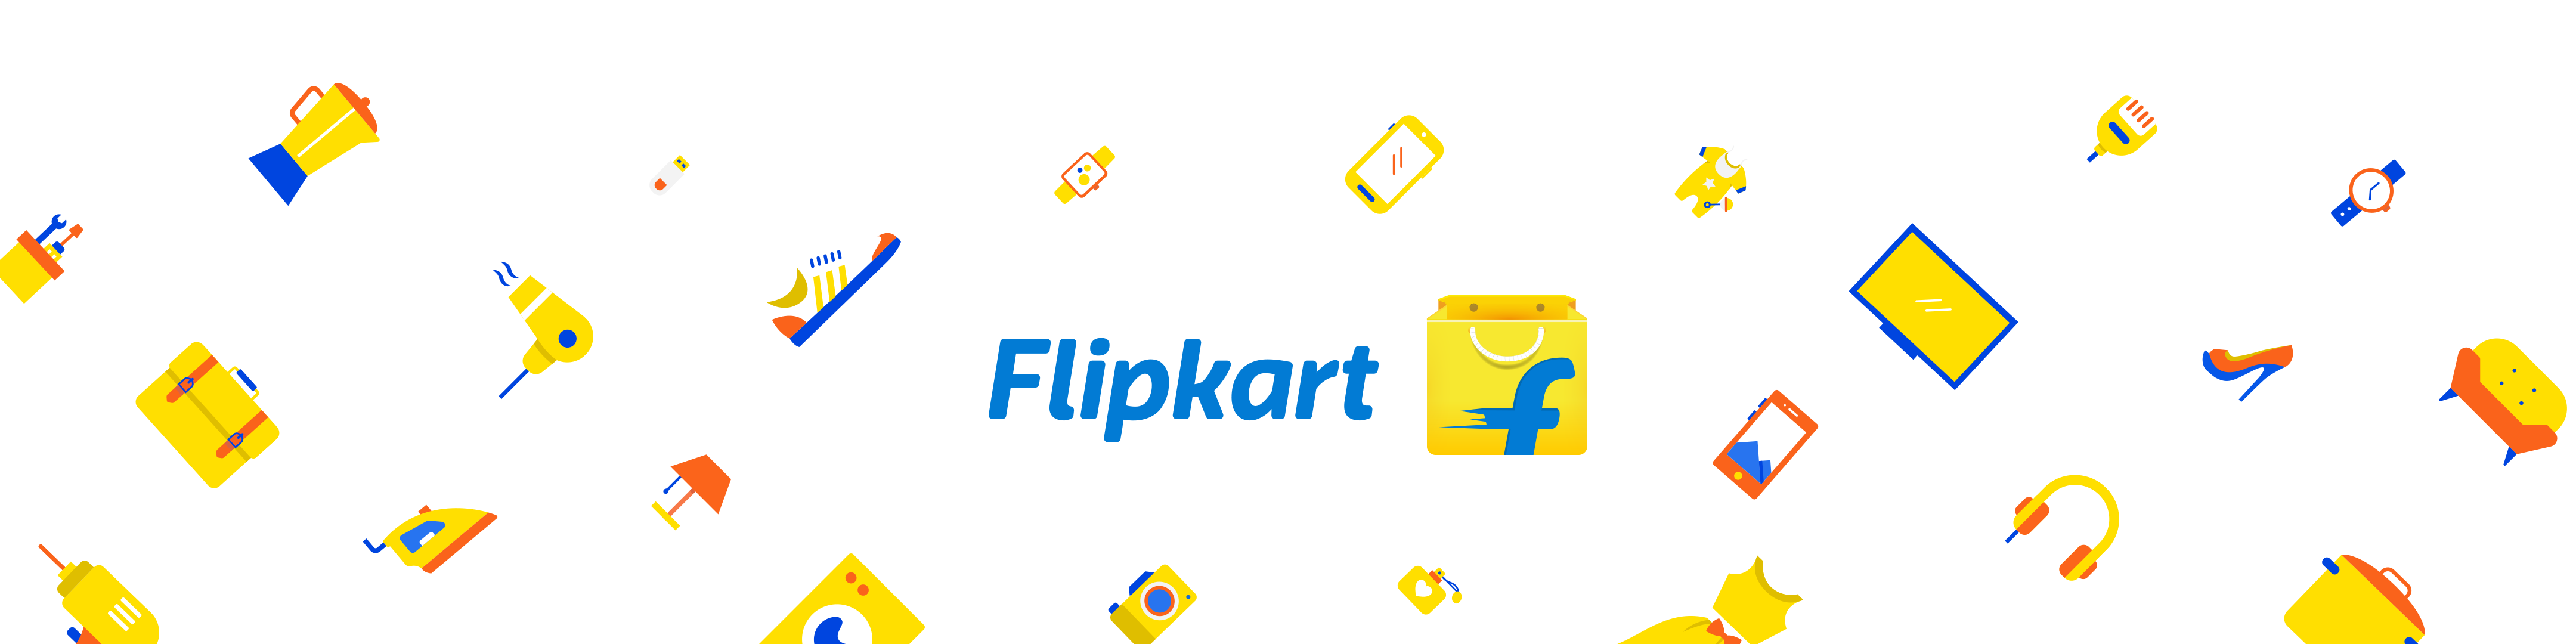 7cb8d81c6 Flipkart - Online Shopping App - Revenue   Download estimates ...